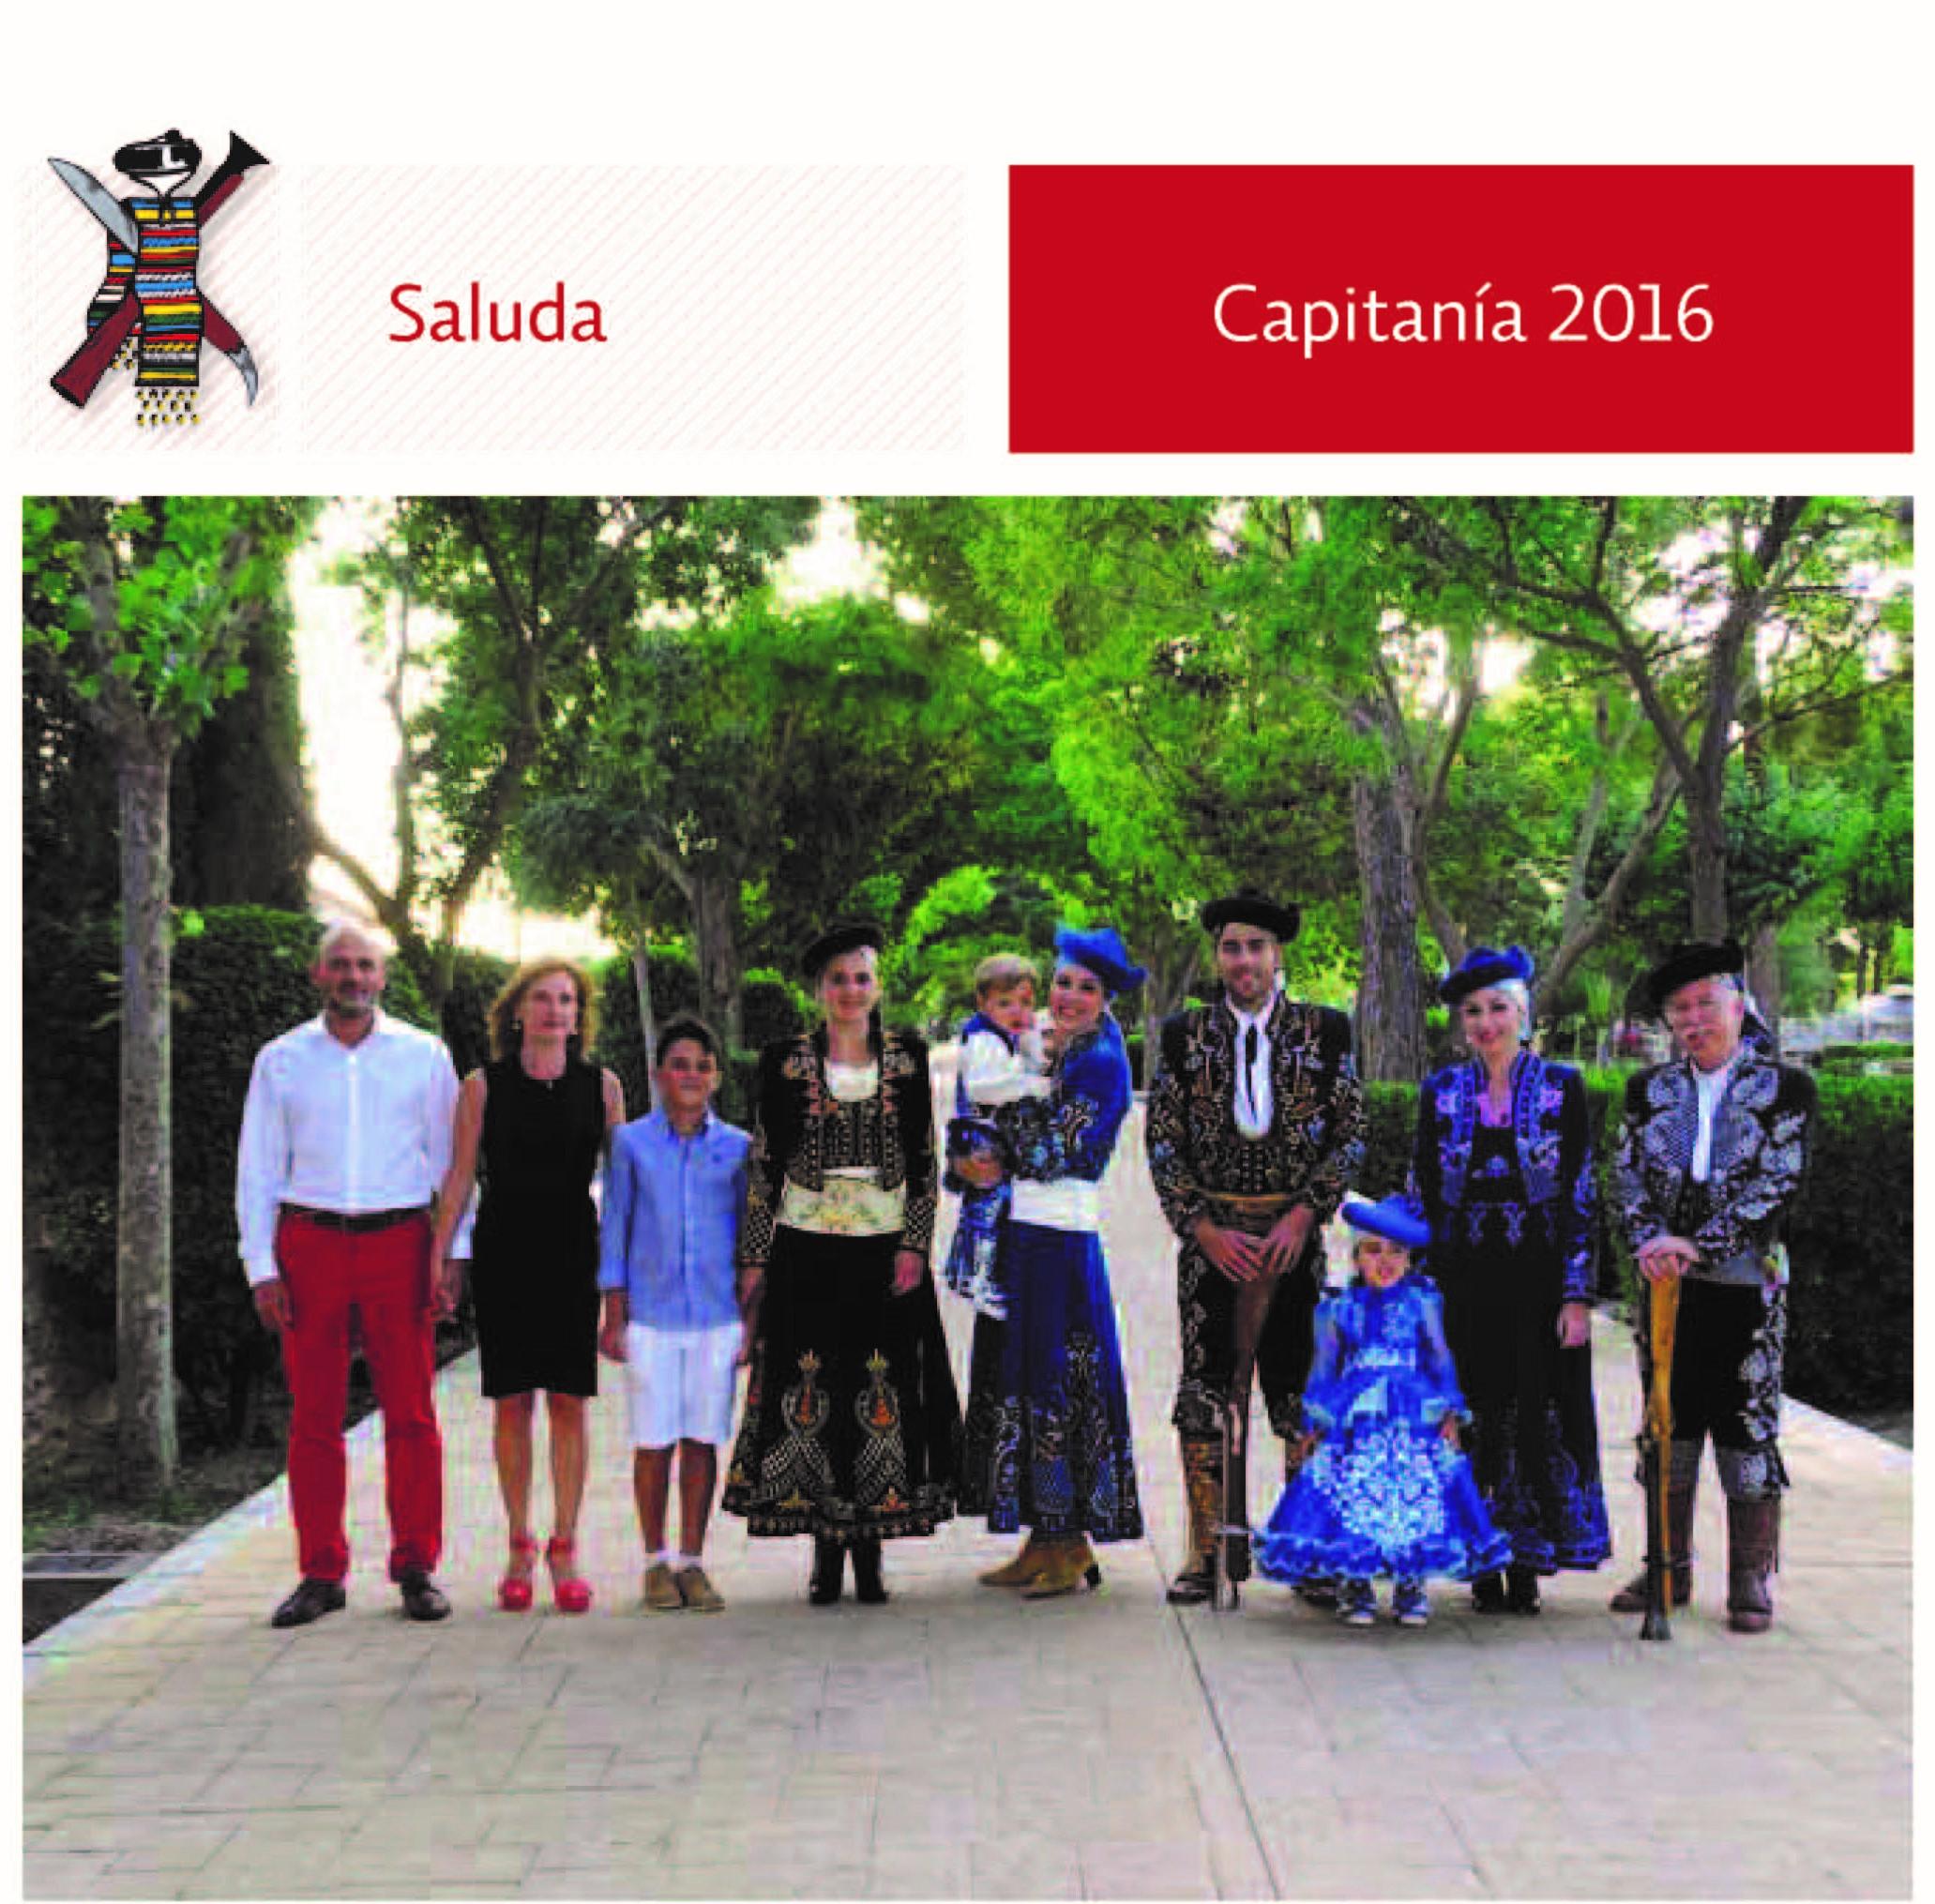 CAPITANIA 2016